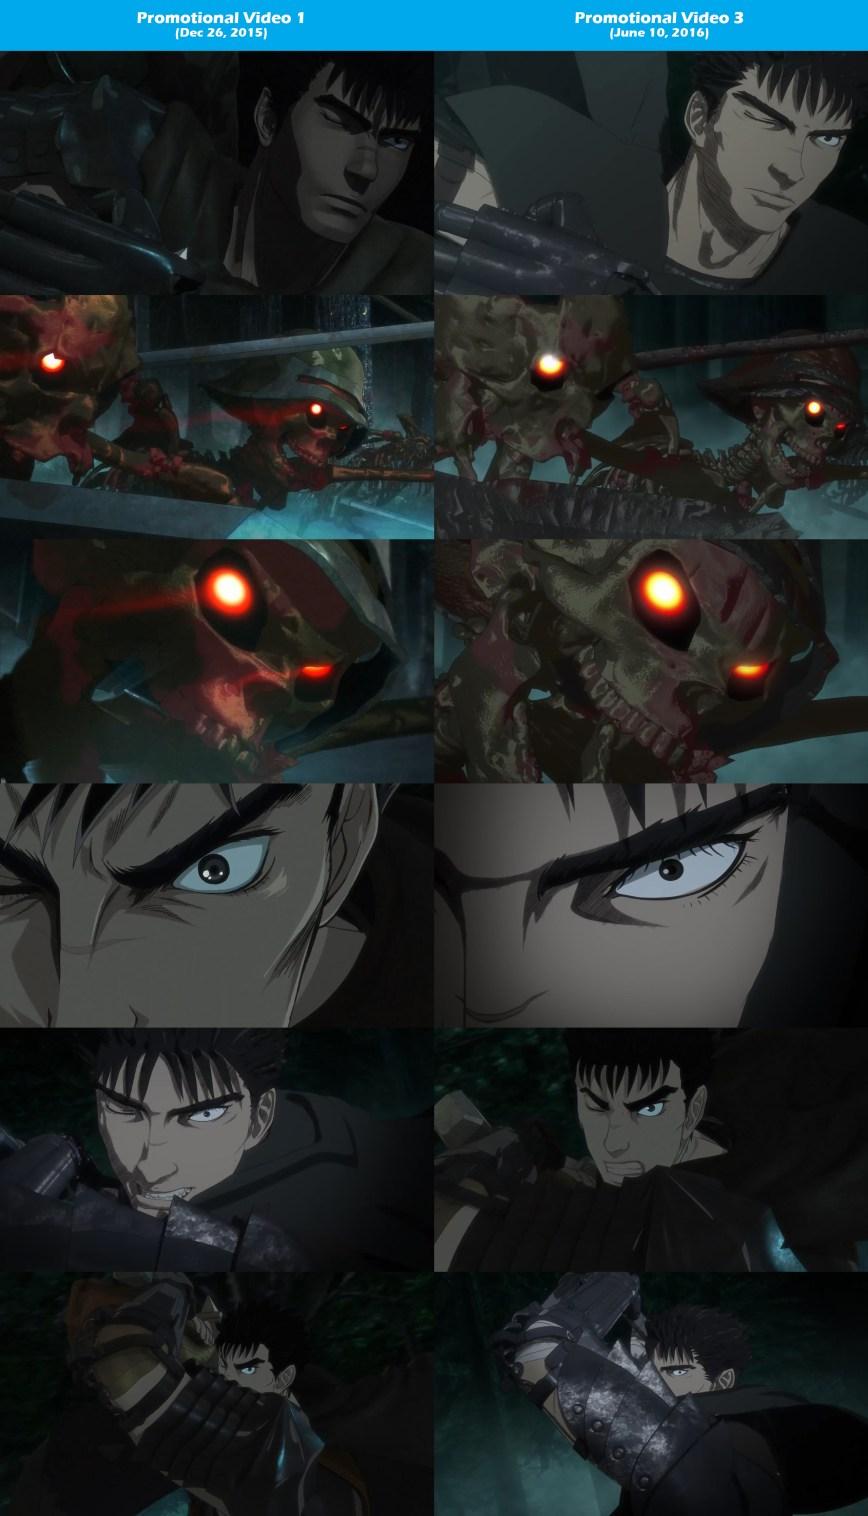 2016-Berserk-Anime-PV-1-vs-PV-3-Comparison-2